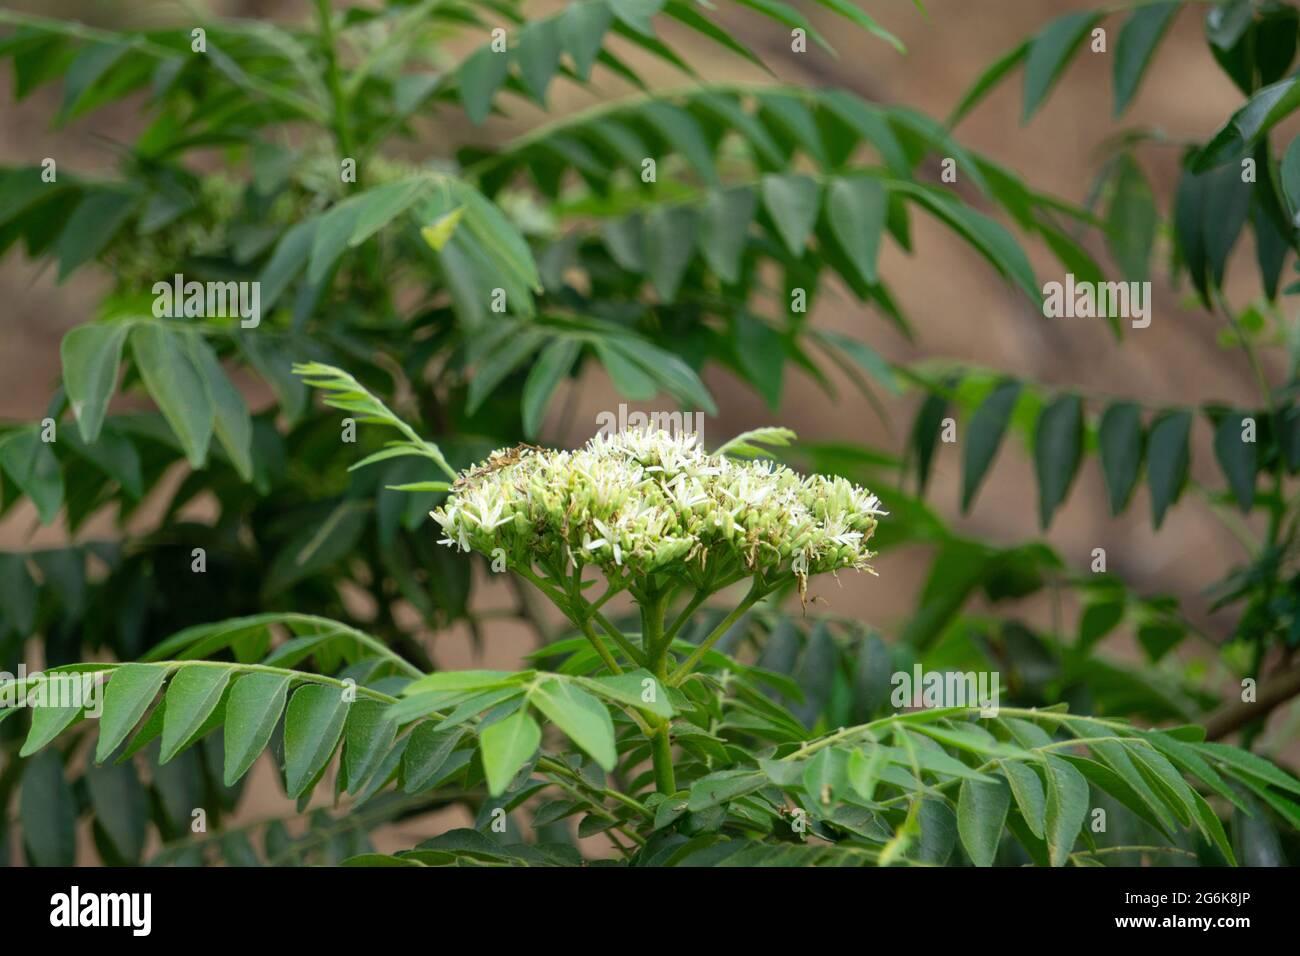 Murraya Koenigii High Resolution Stock Photography And Images Alamy